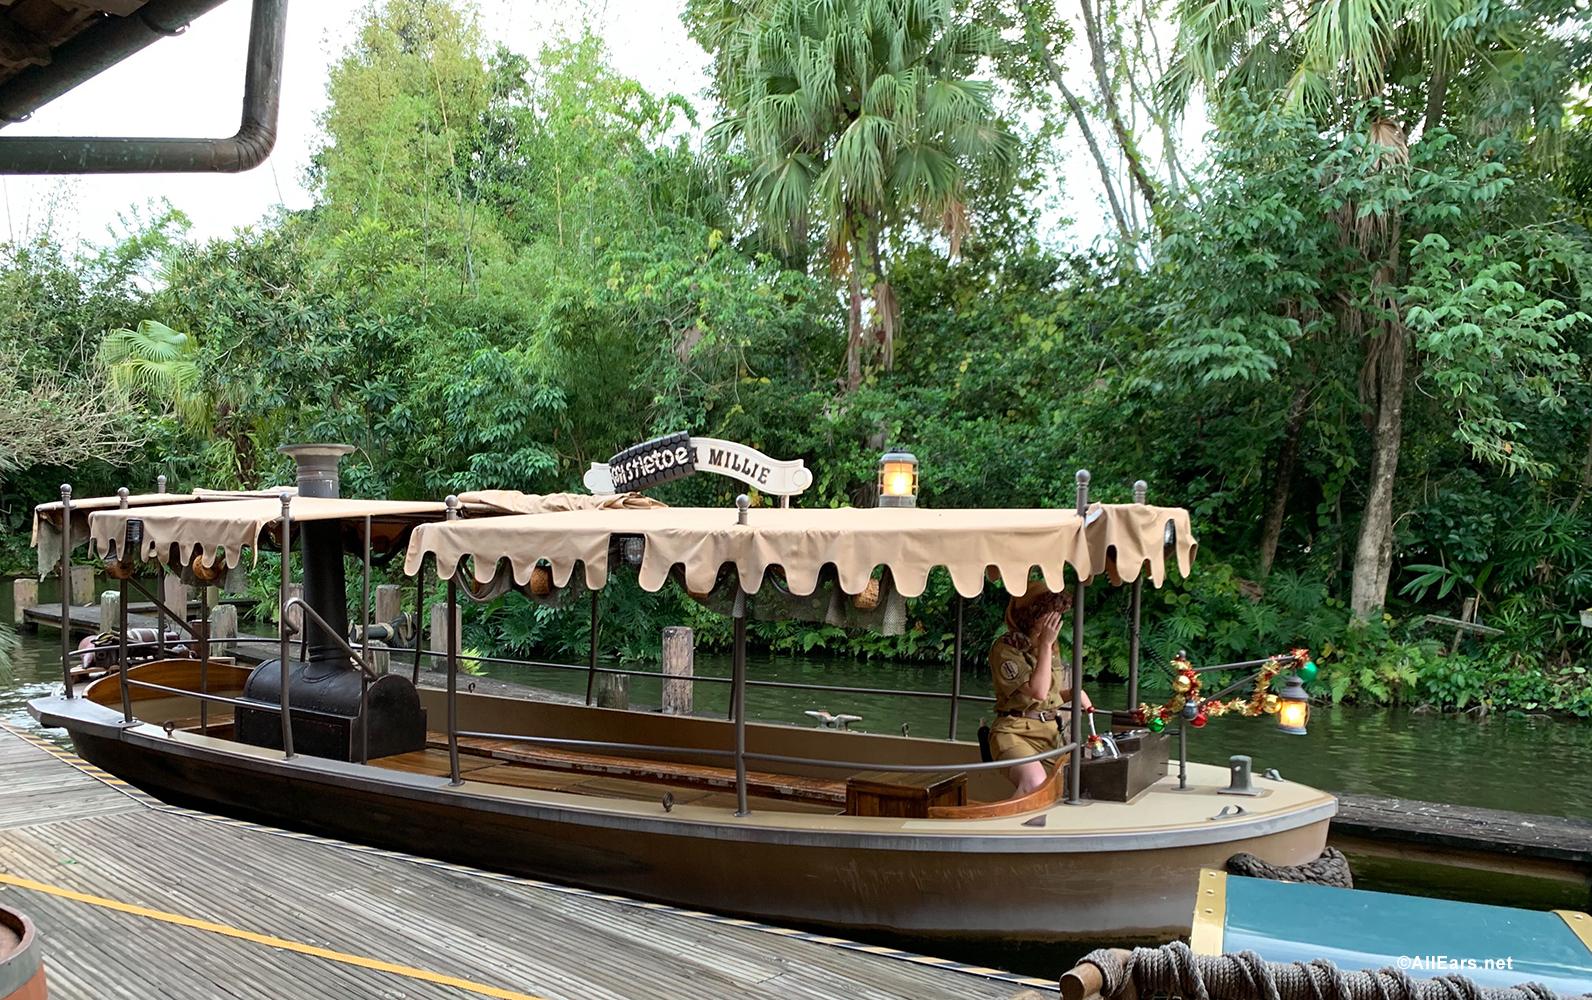 BREAKING: A Jungle Cruise Boat Sank at Disney's Magic Kingdom! - AllEars.Net